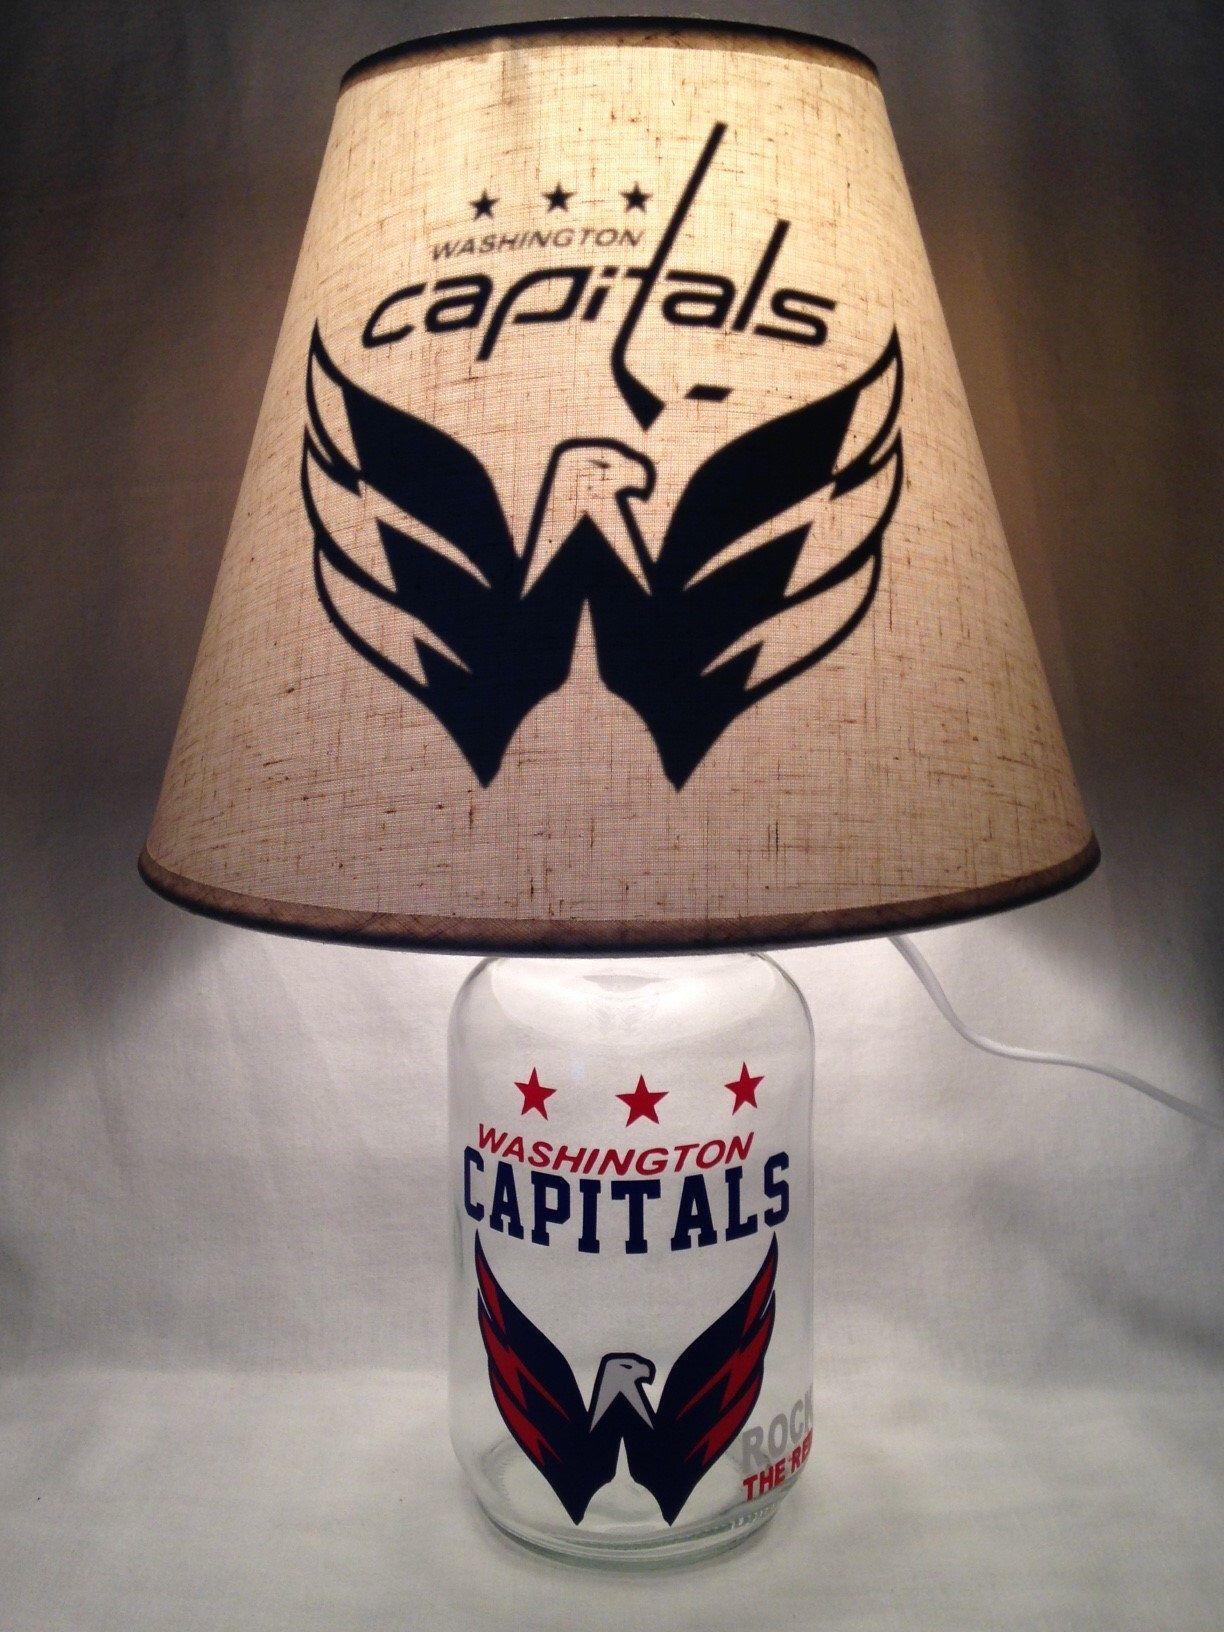 Washington Capitals night light